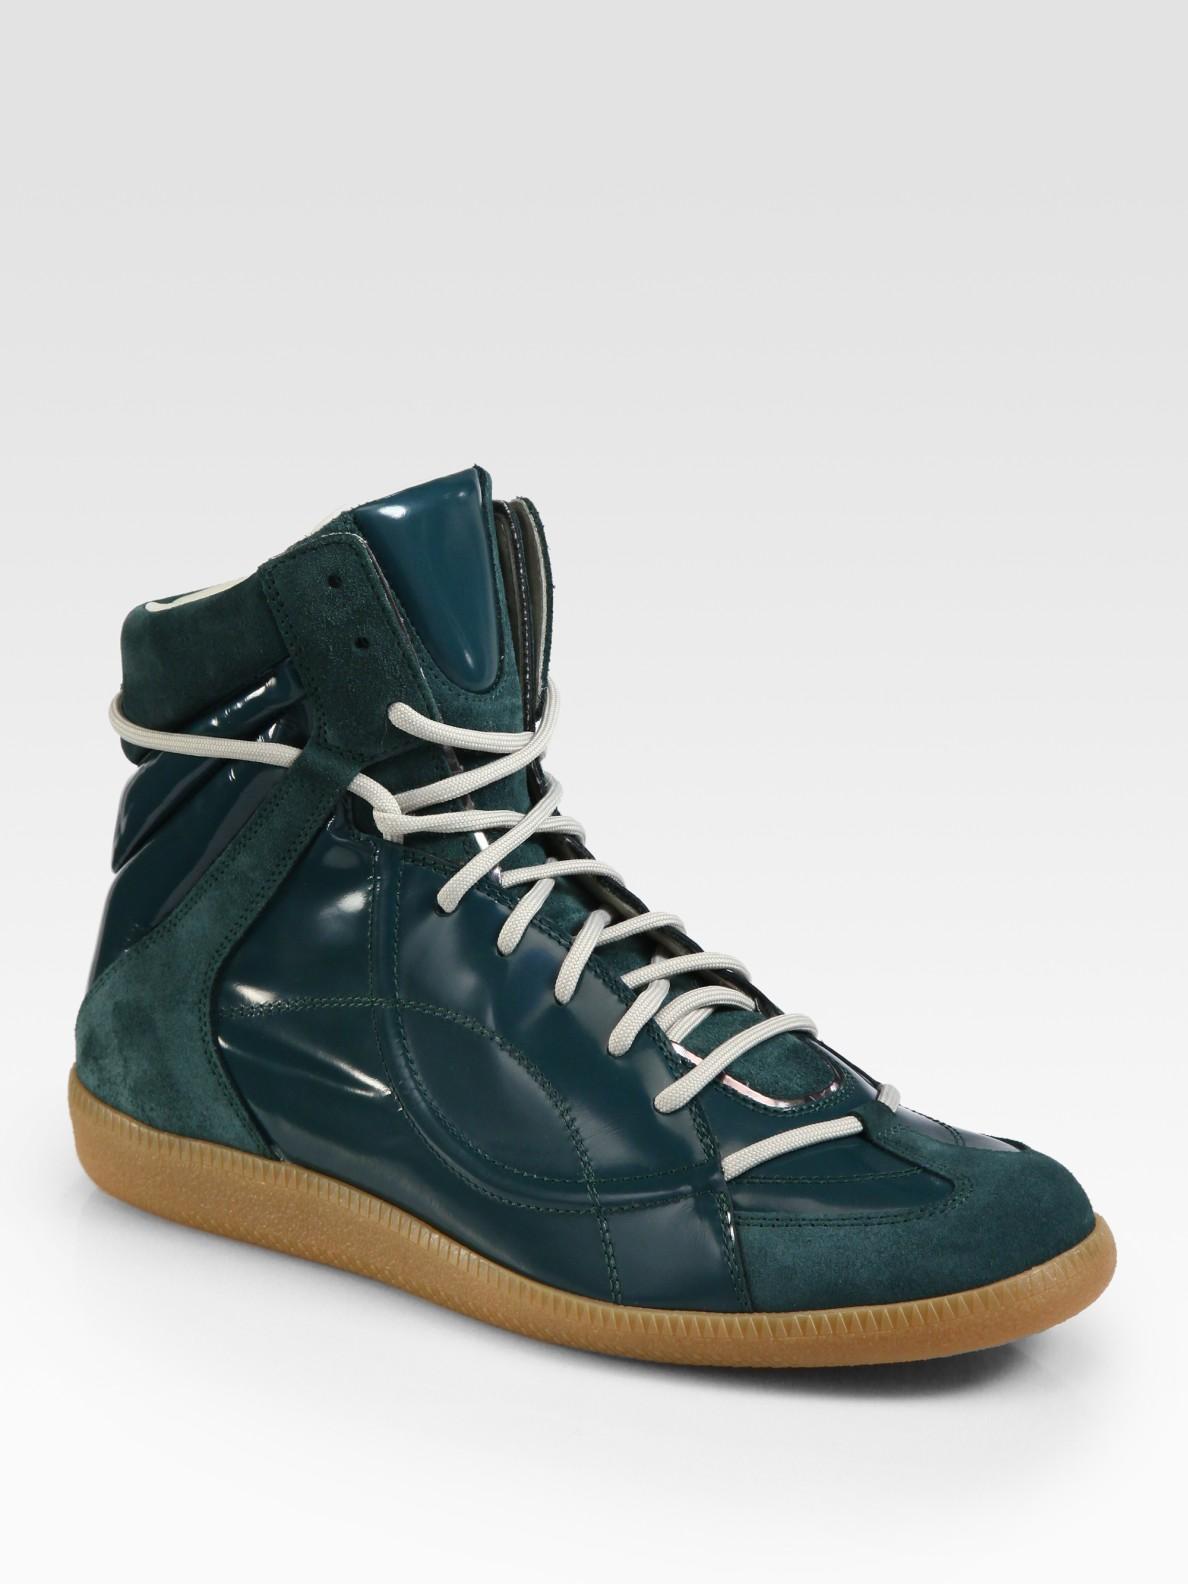 maison margiela hightop sneaker in green for men turquoise lyst. Black Bedroom Furniture Sets. Home Design Ideas